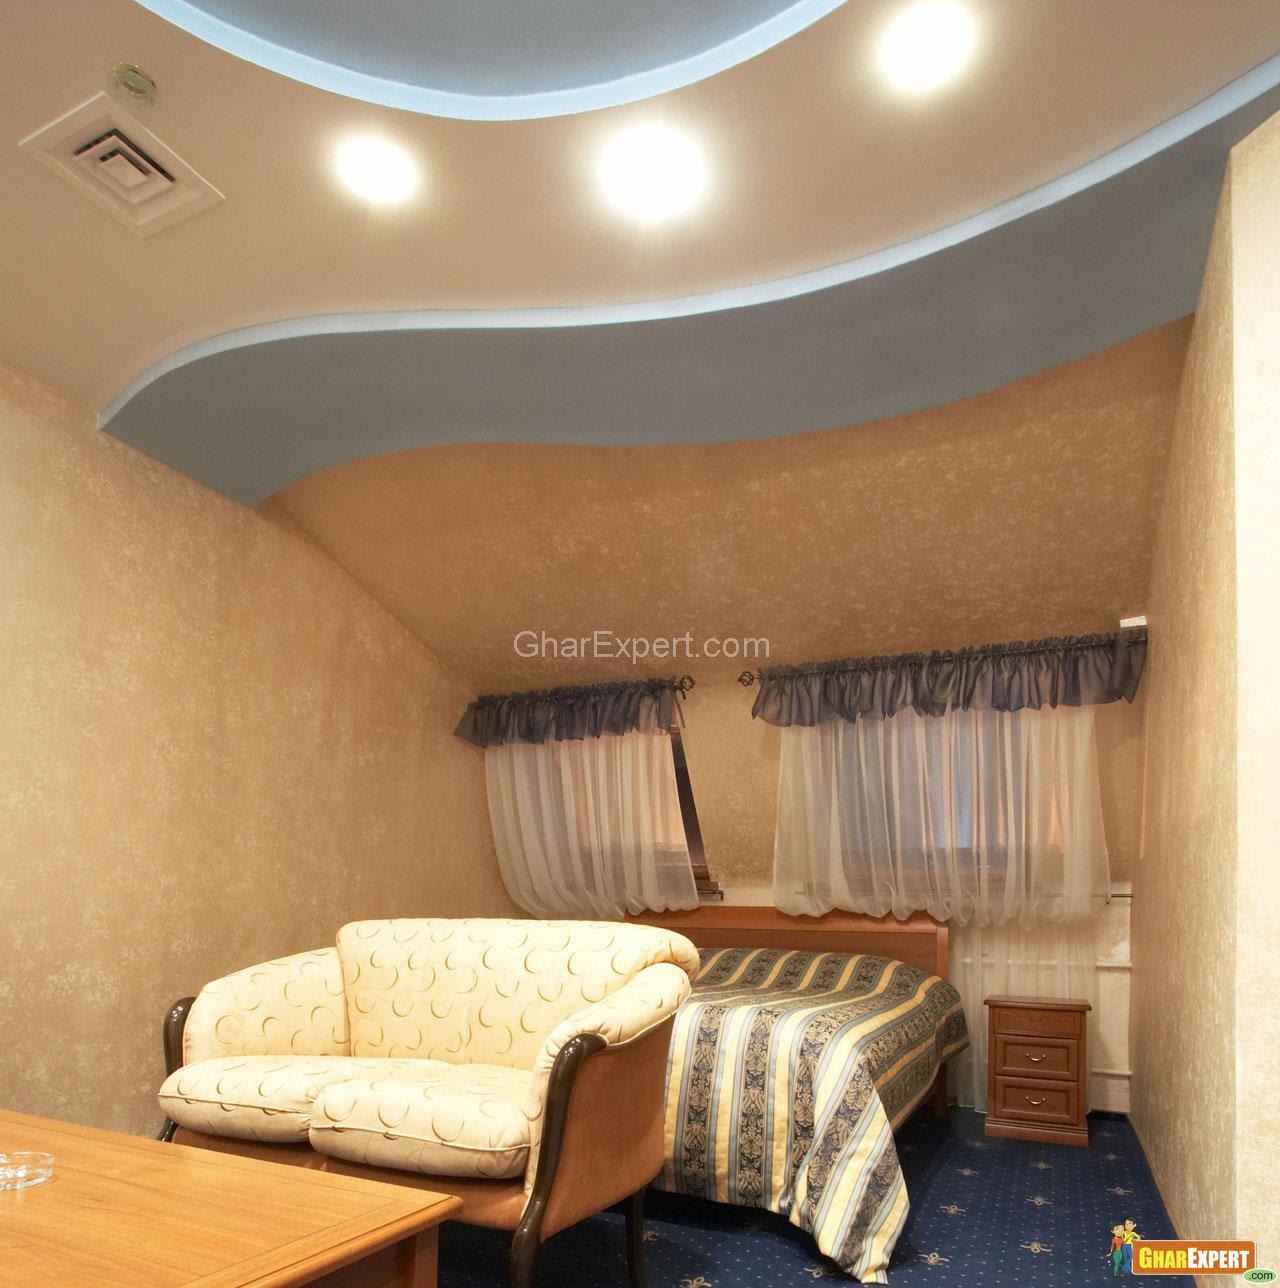 10 Lighting Ideas That Will Transform A Bedroom Design: Interior Decorating Las Vegas